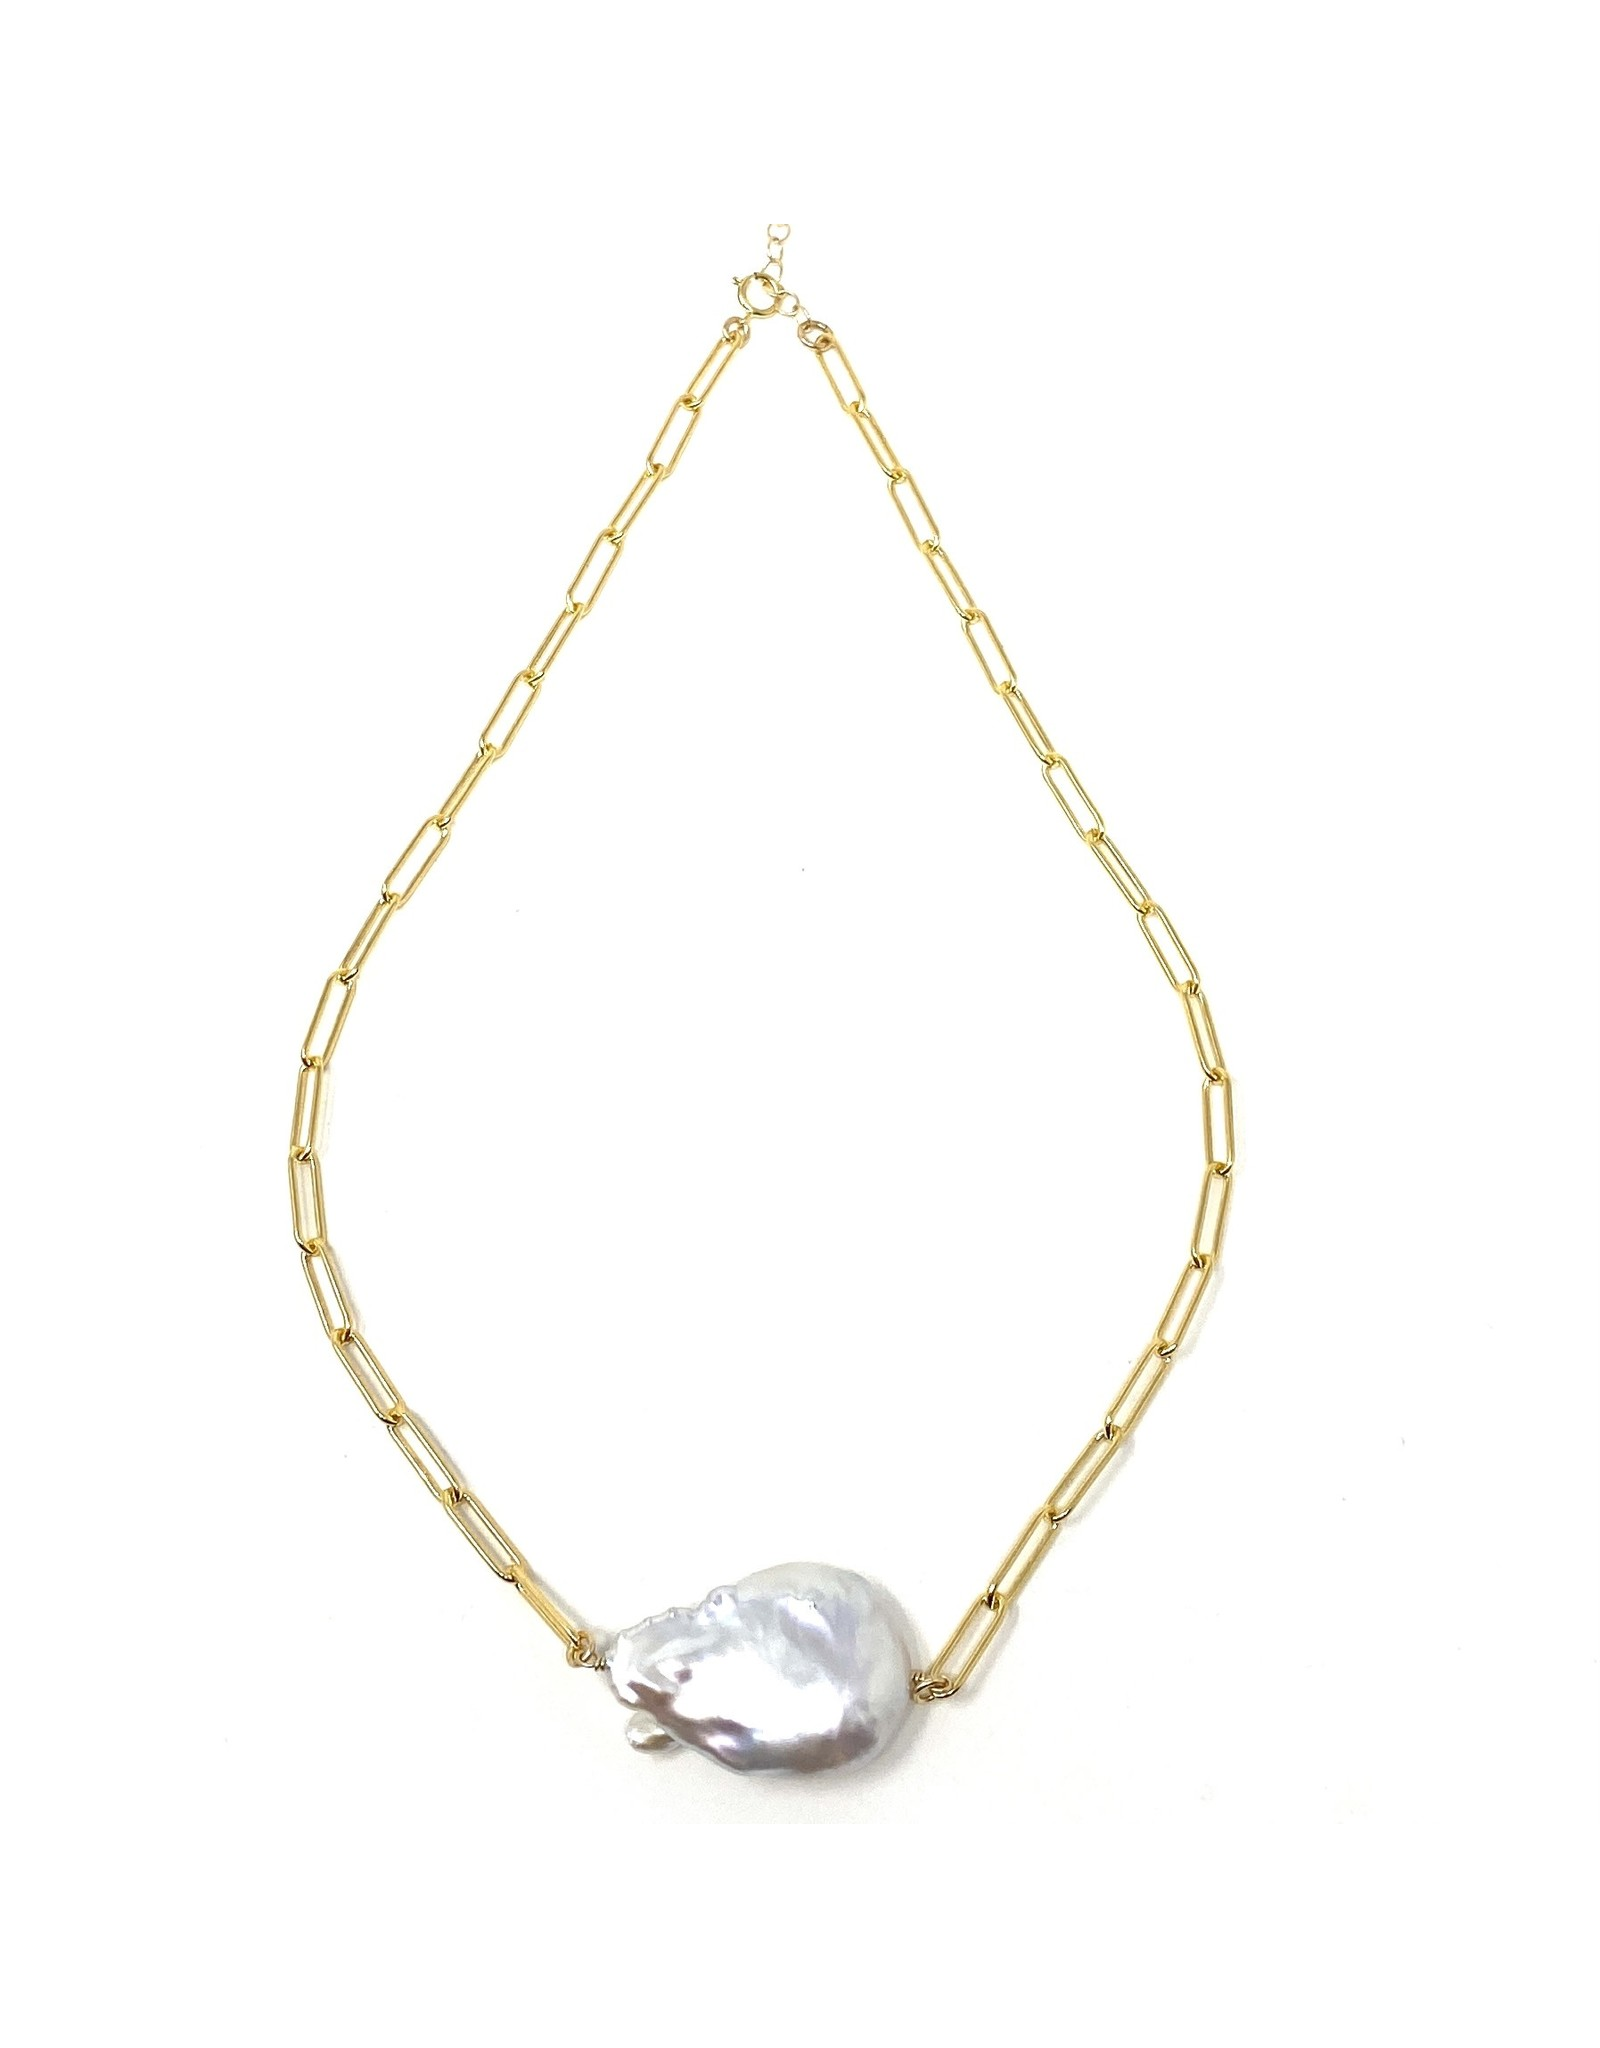 GF Paperclip Chain & Keshi Pearl